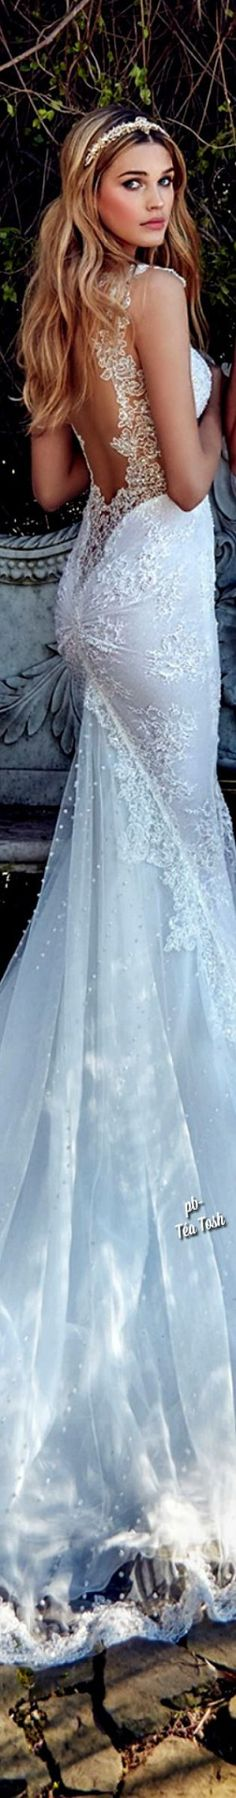 ❇Téa Tosh❇Galia Lahav, Le Secret Royal, Spring 2017, Haute Couture, Bridal